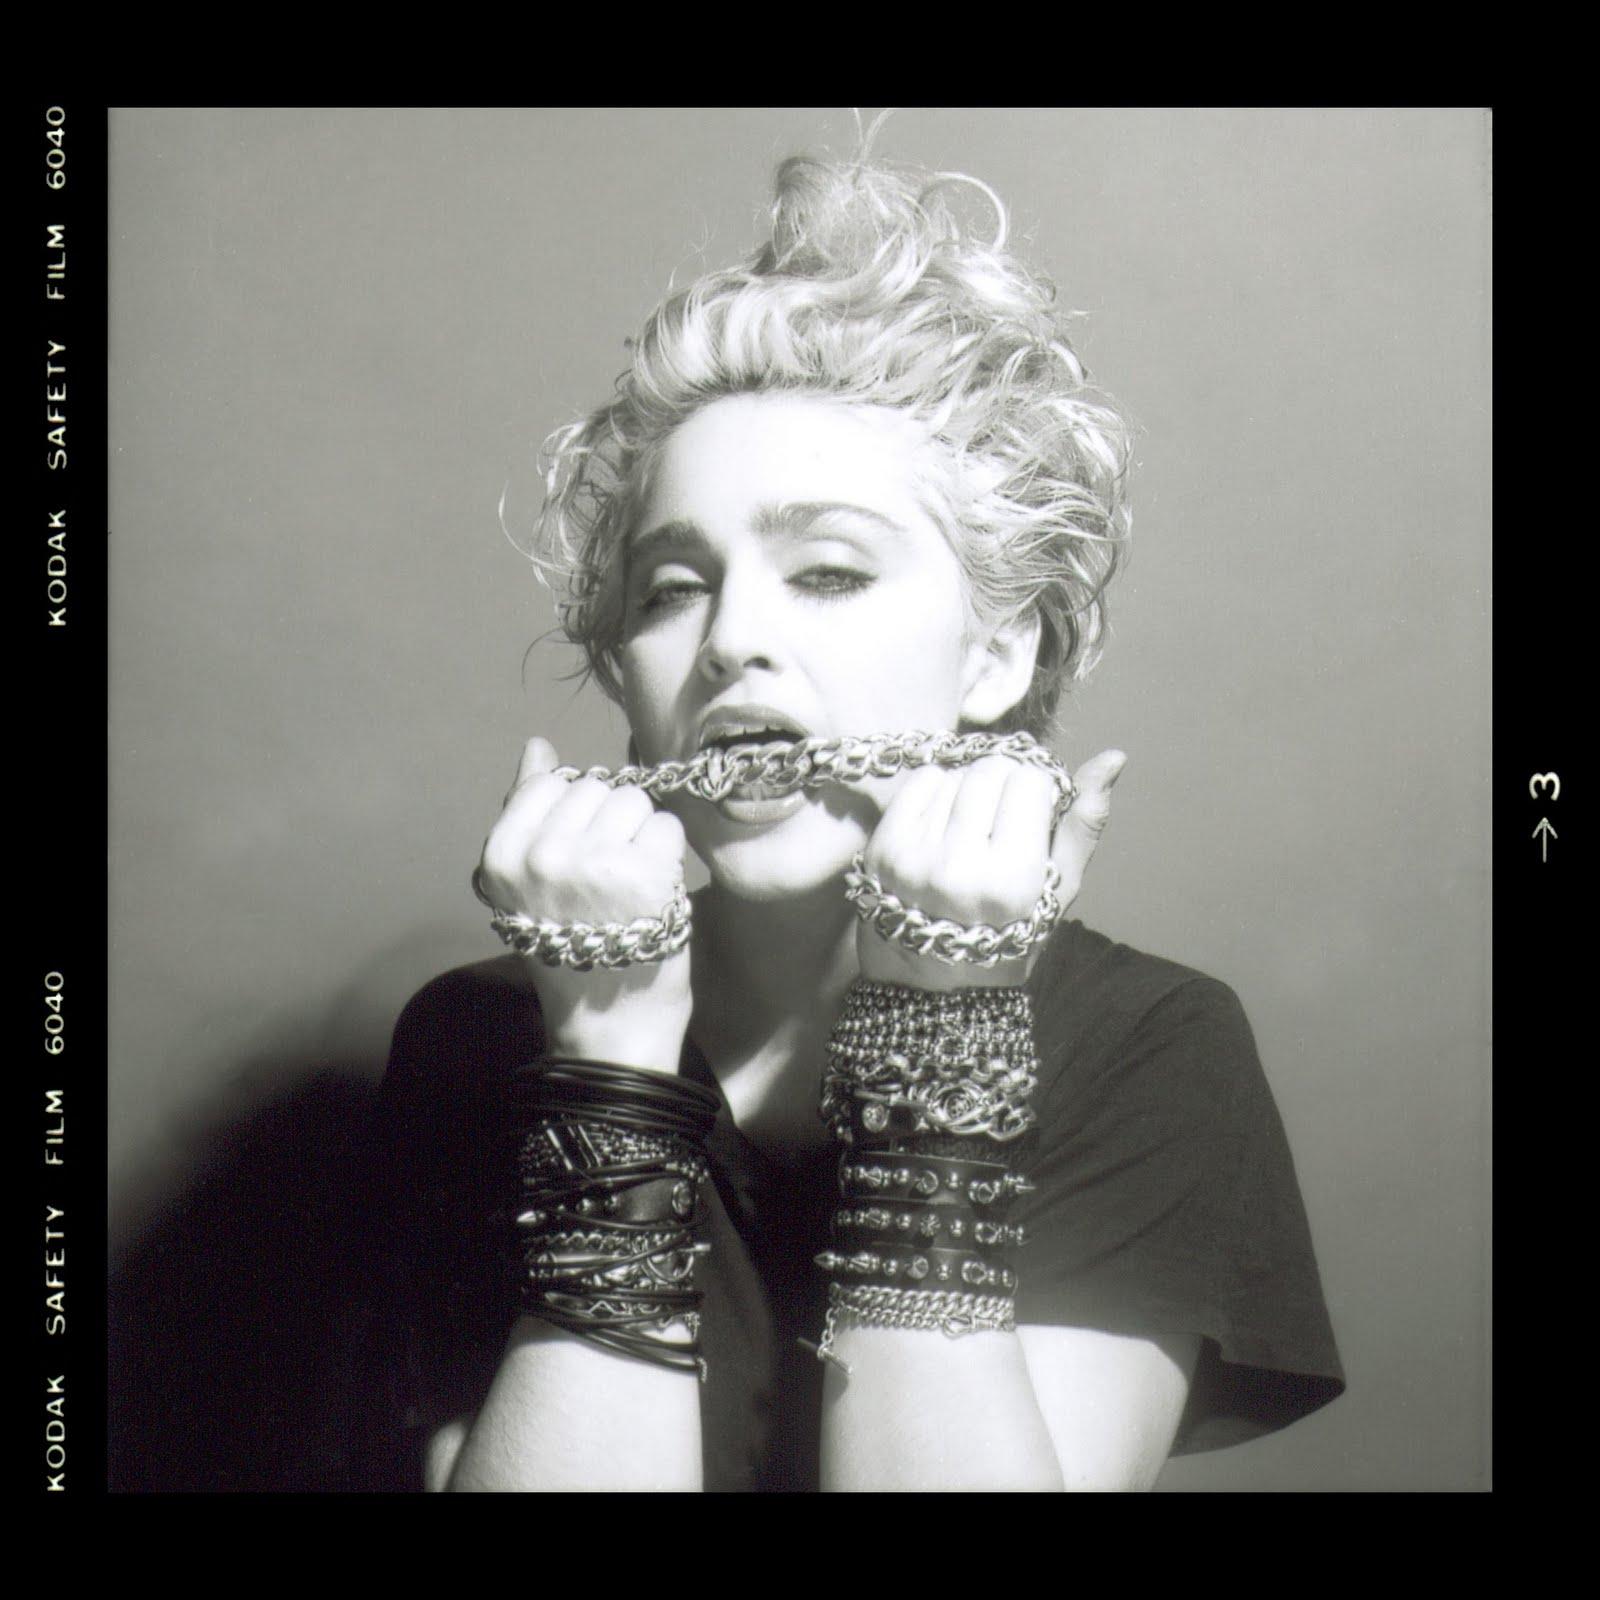 http://3.bp.blogspot.com/-C4V1WAJ_owA/TkrcvyXX8wI/AAAAAAAAAJo/DYrQvYoEJqo/s1600/Madonna_148.jpg